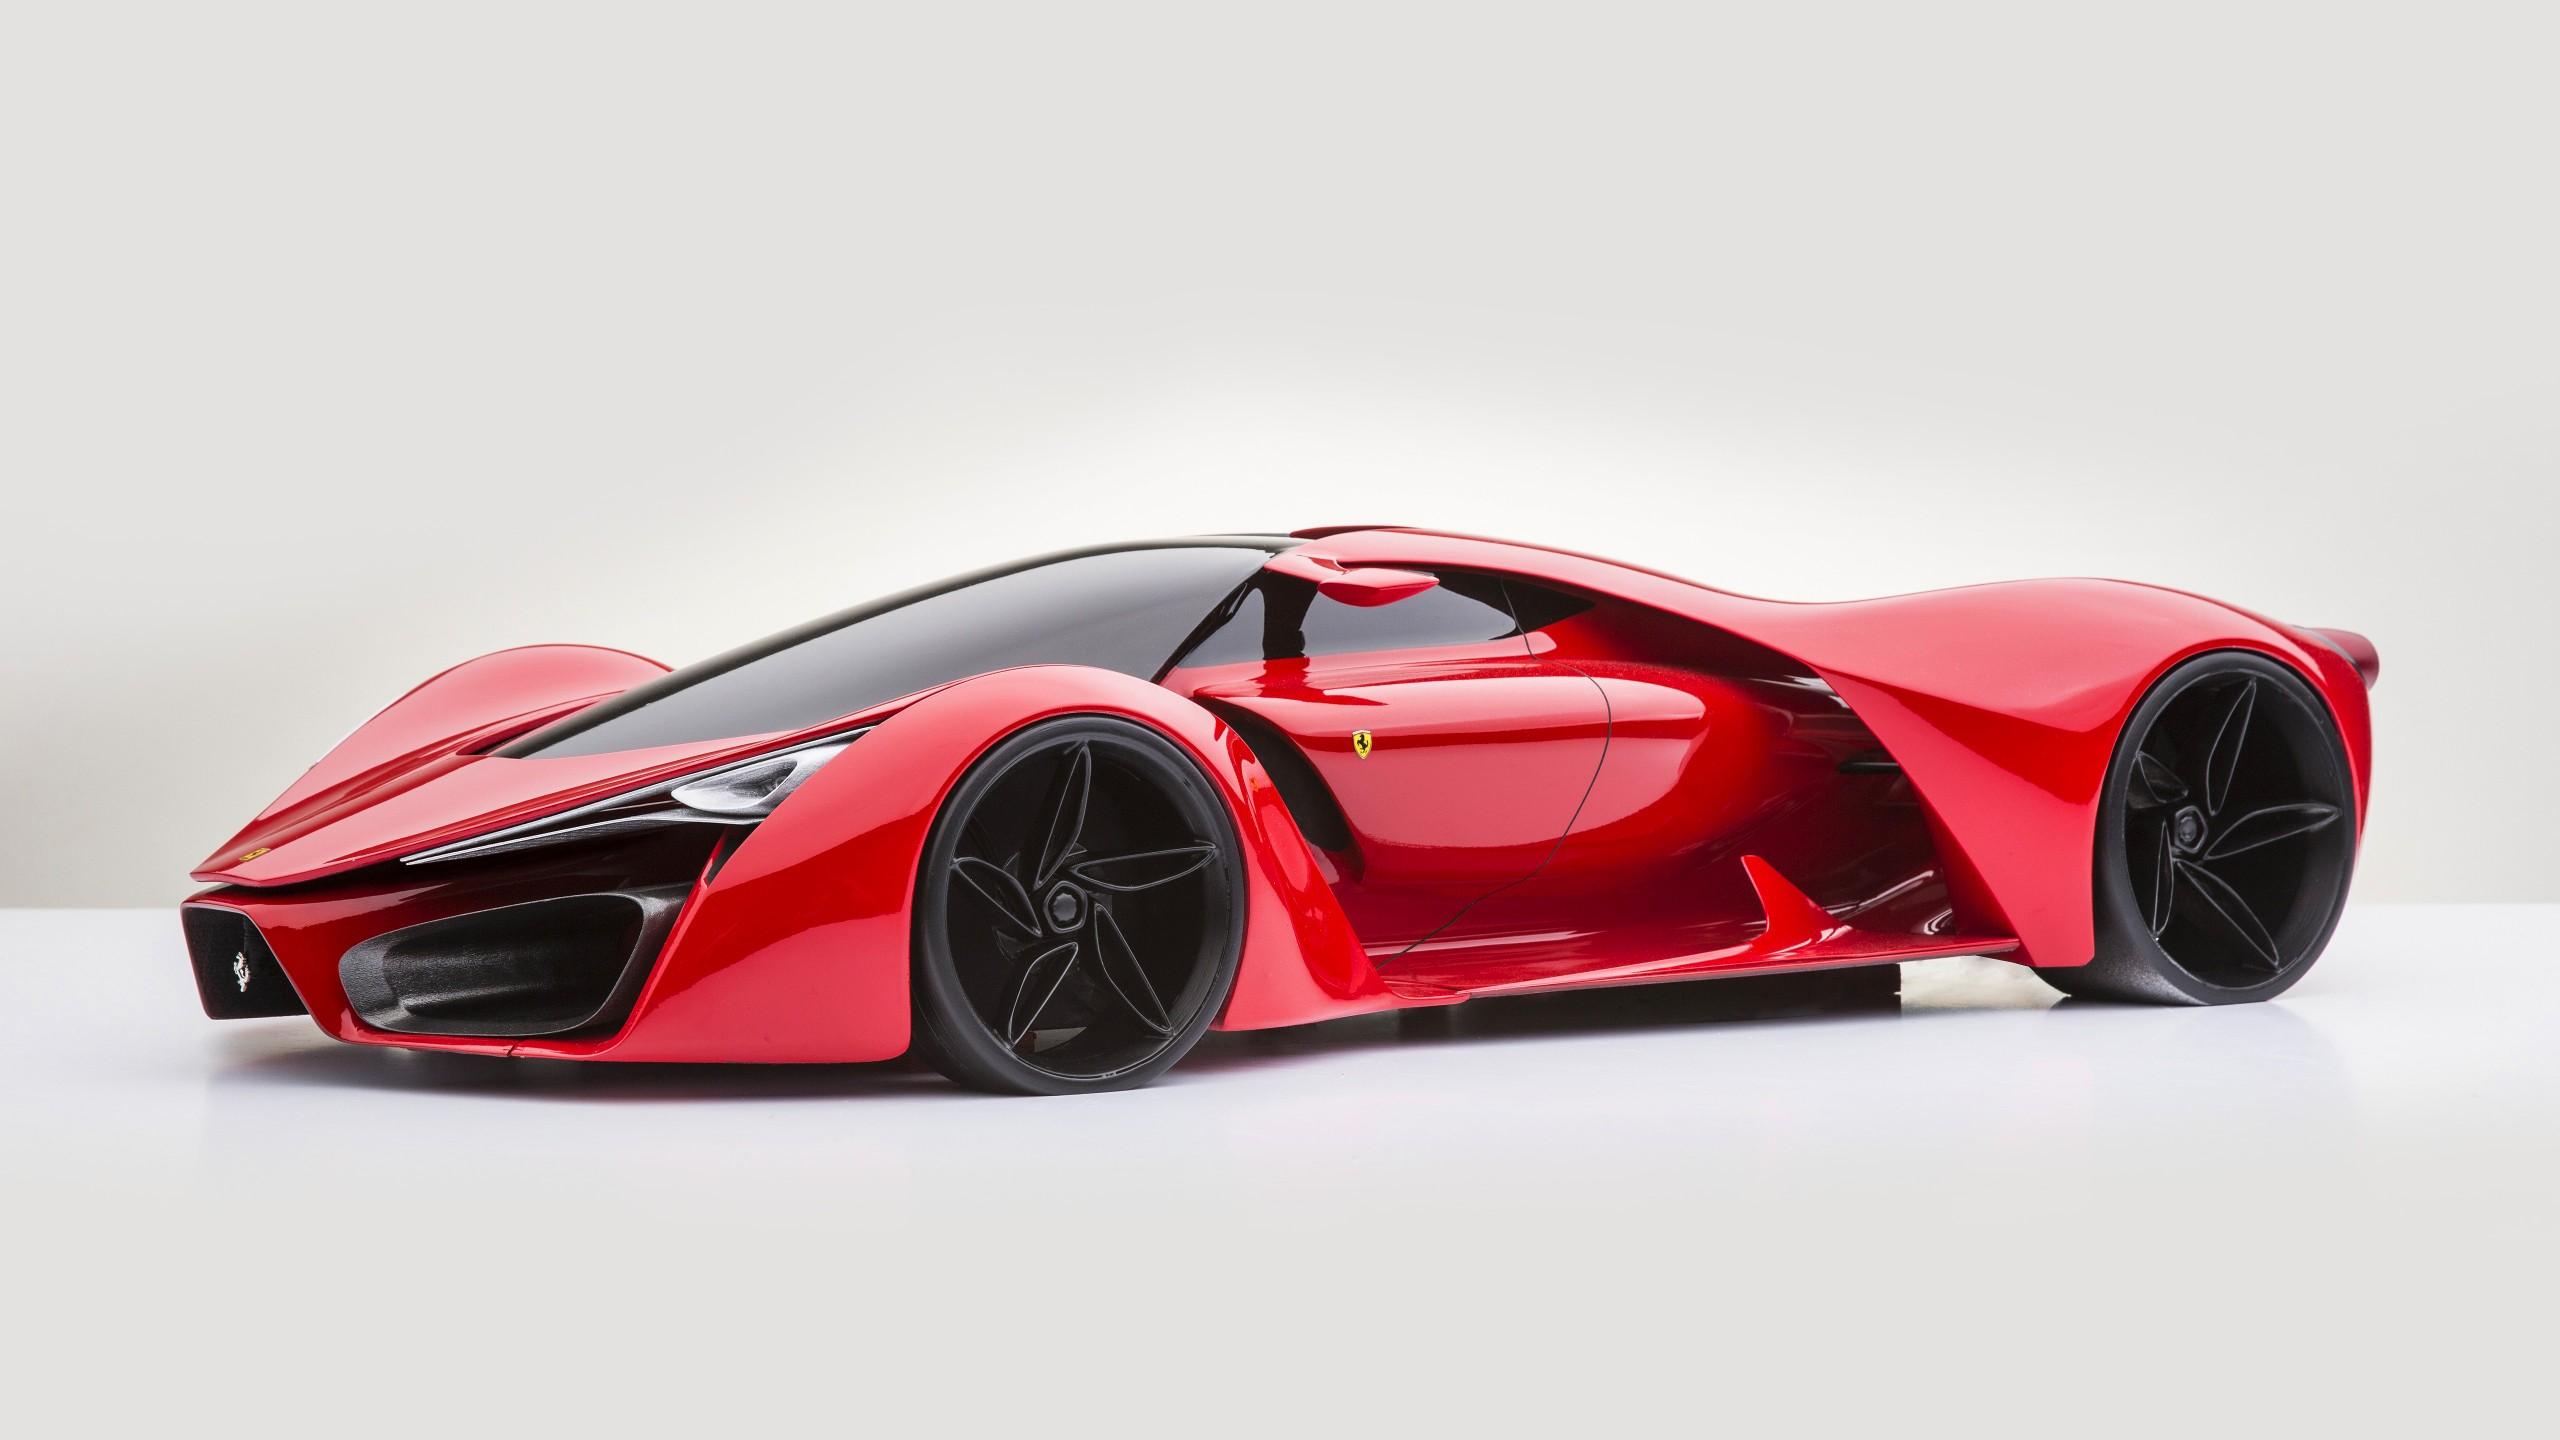 Wallpaper Ferrari LaFerrari, 5k, 4k wallpaper, hybrid, sports car, concept, Ferrari, supercar ...